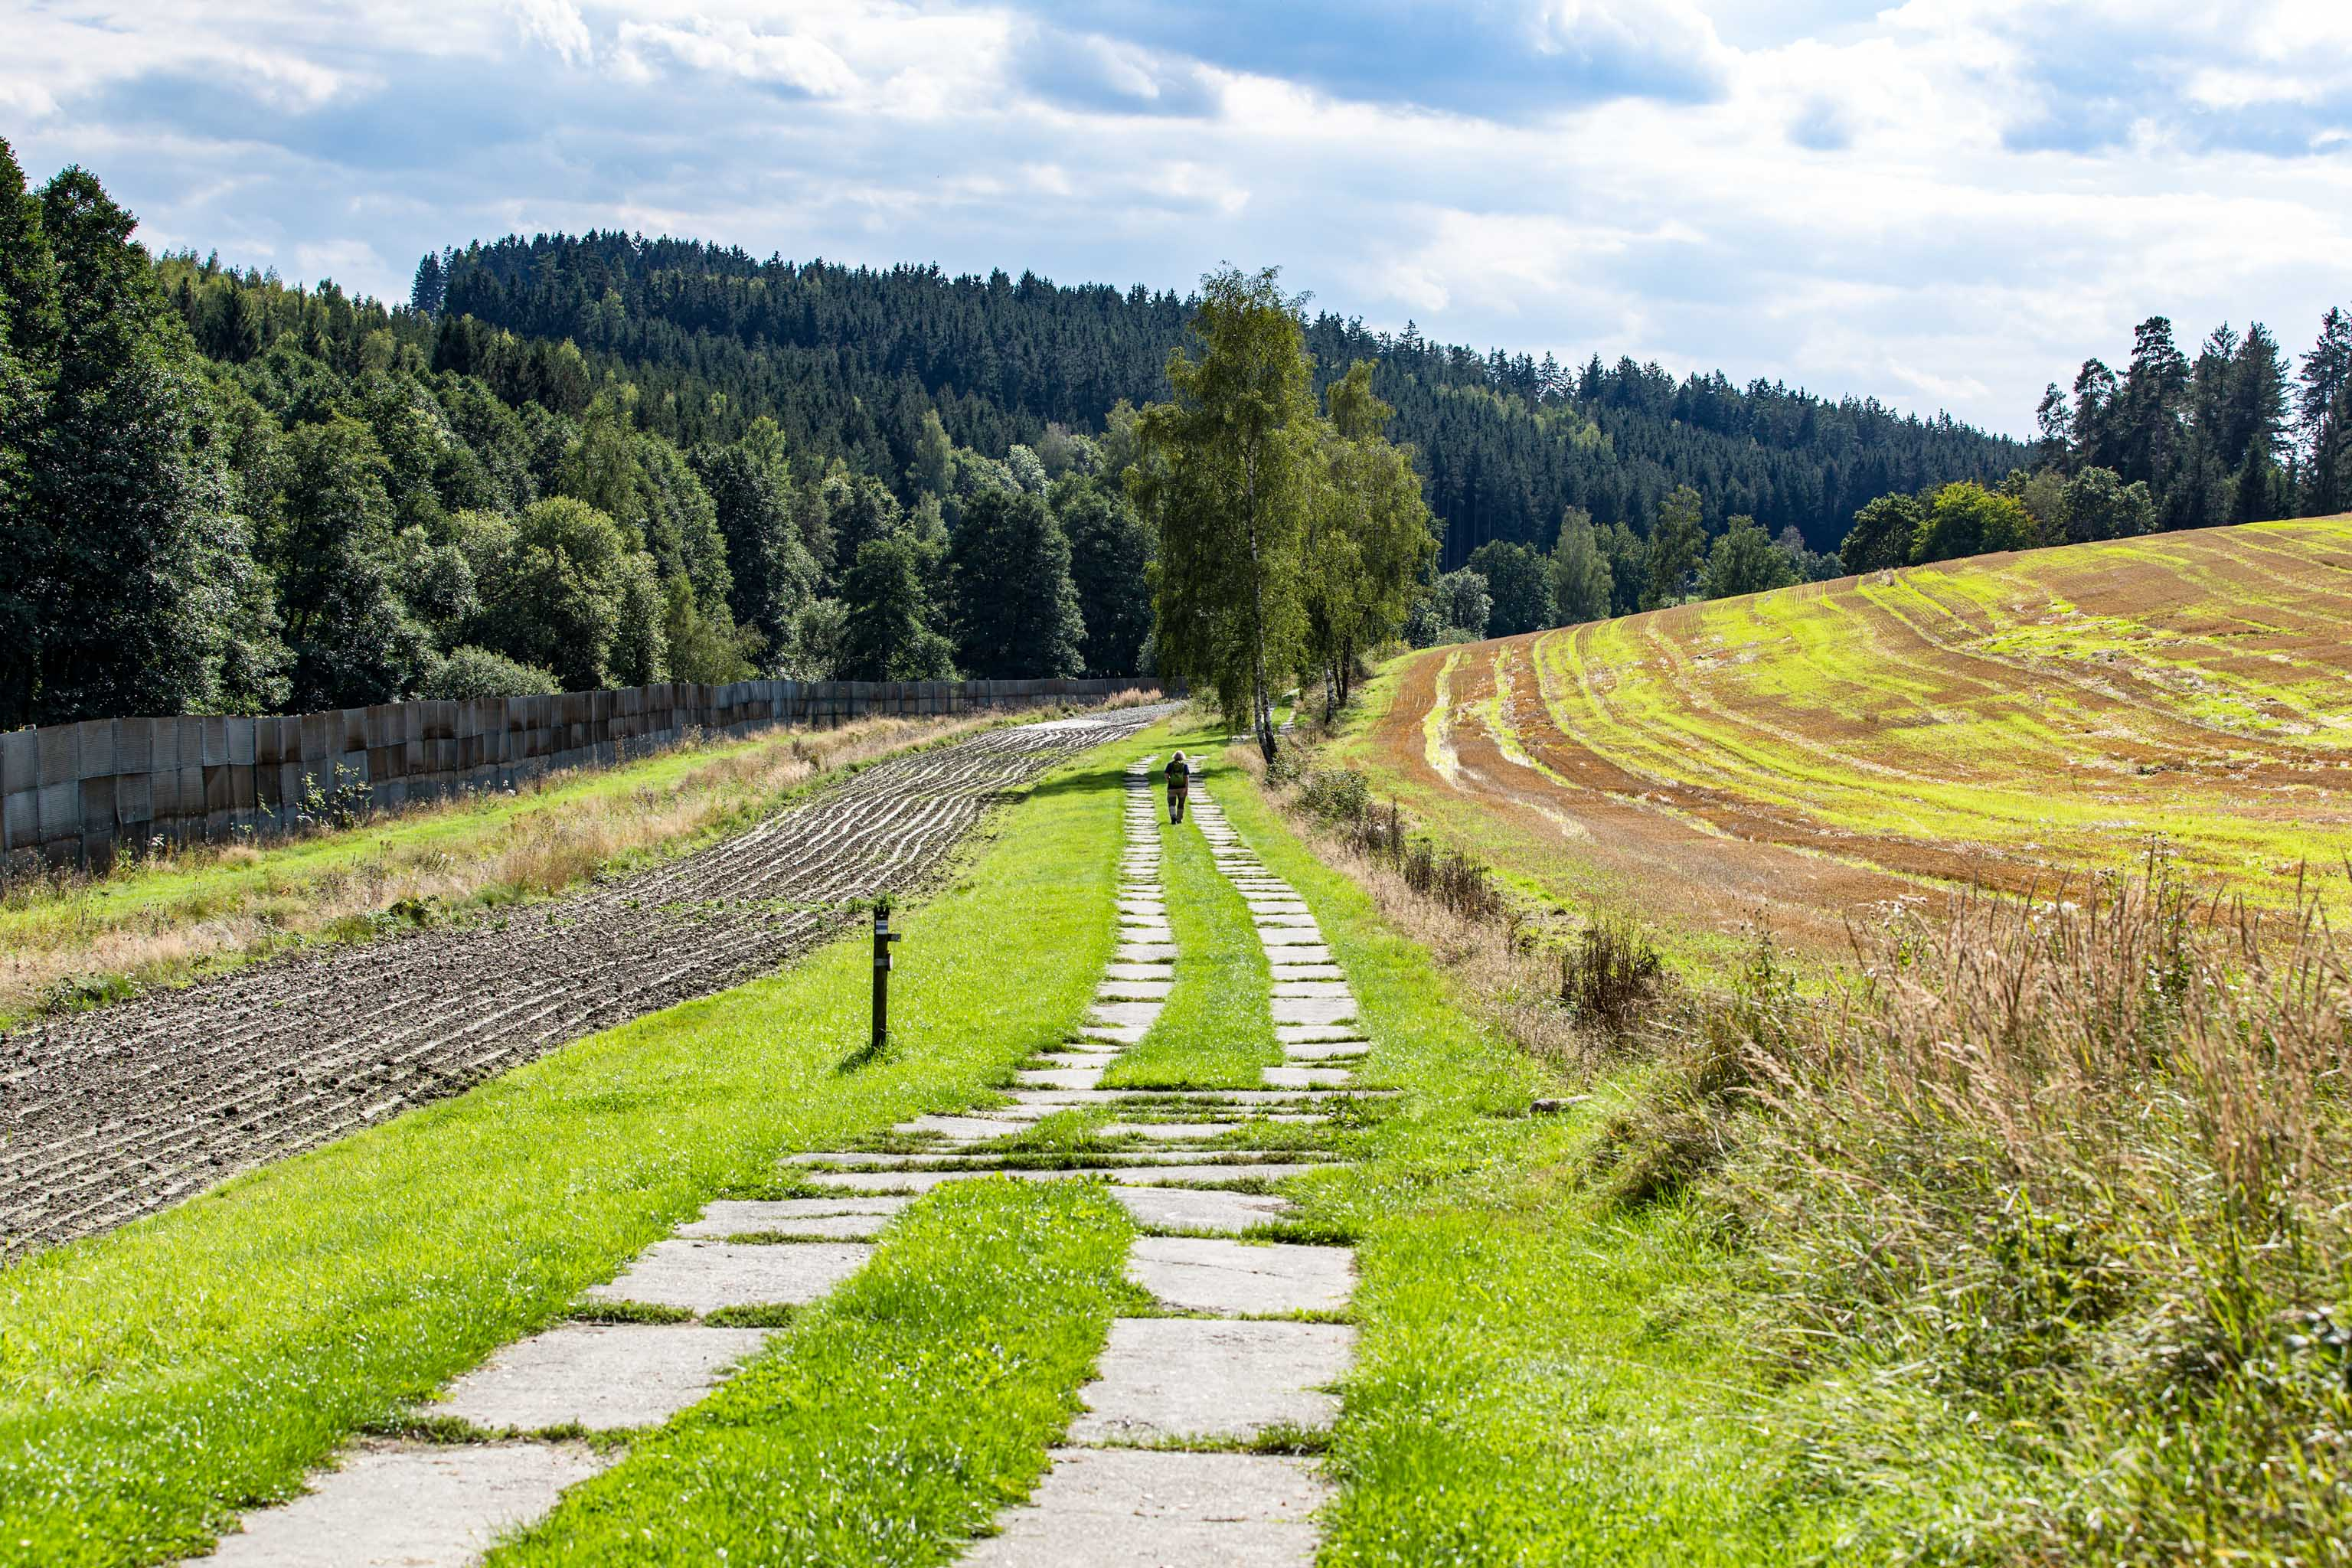 Green Belt Mödlareuth - long distance hiking - hiking trails Germany - hiking in Germany - top trails in Germany - Long distance hiking trails - Long distance trails - best long distance hikes in the world